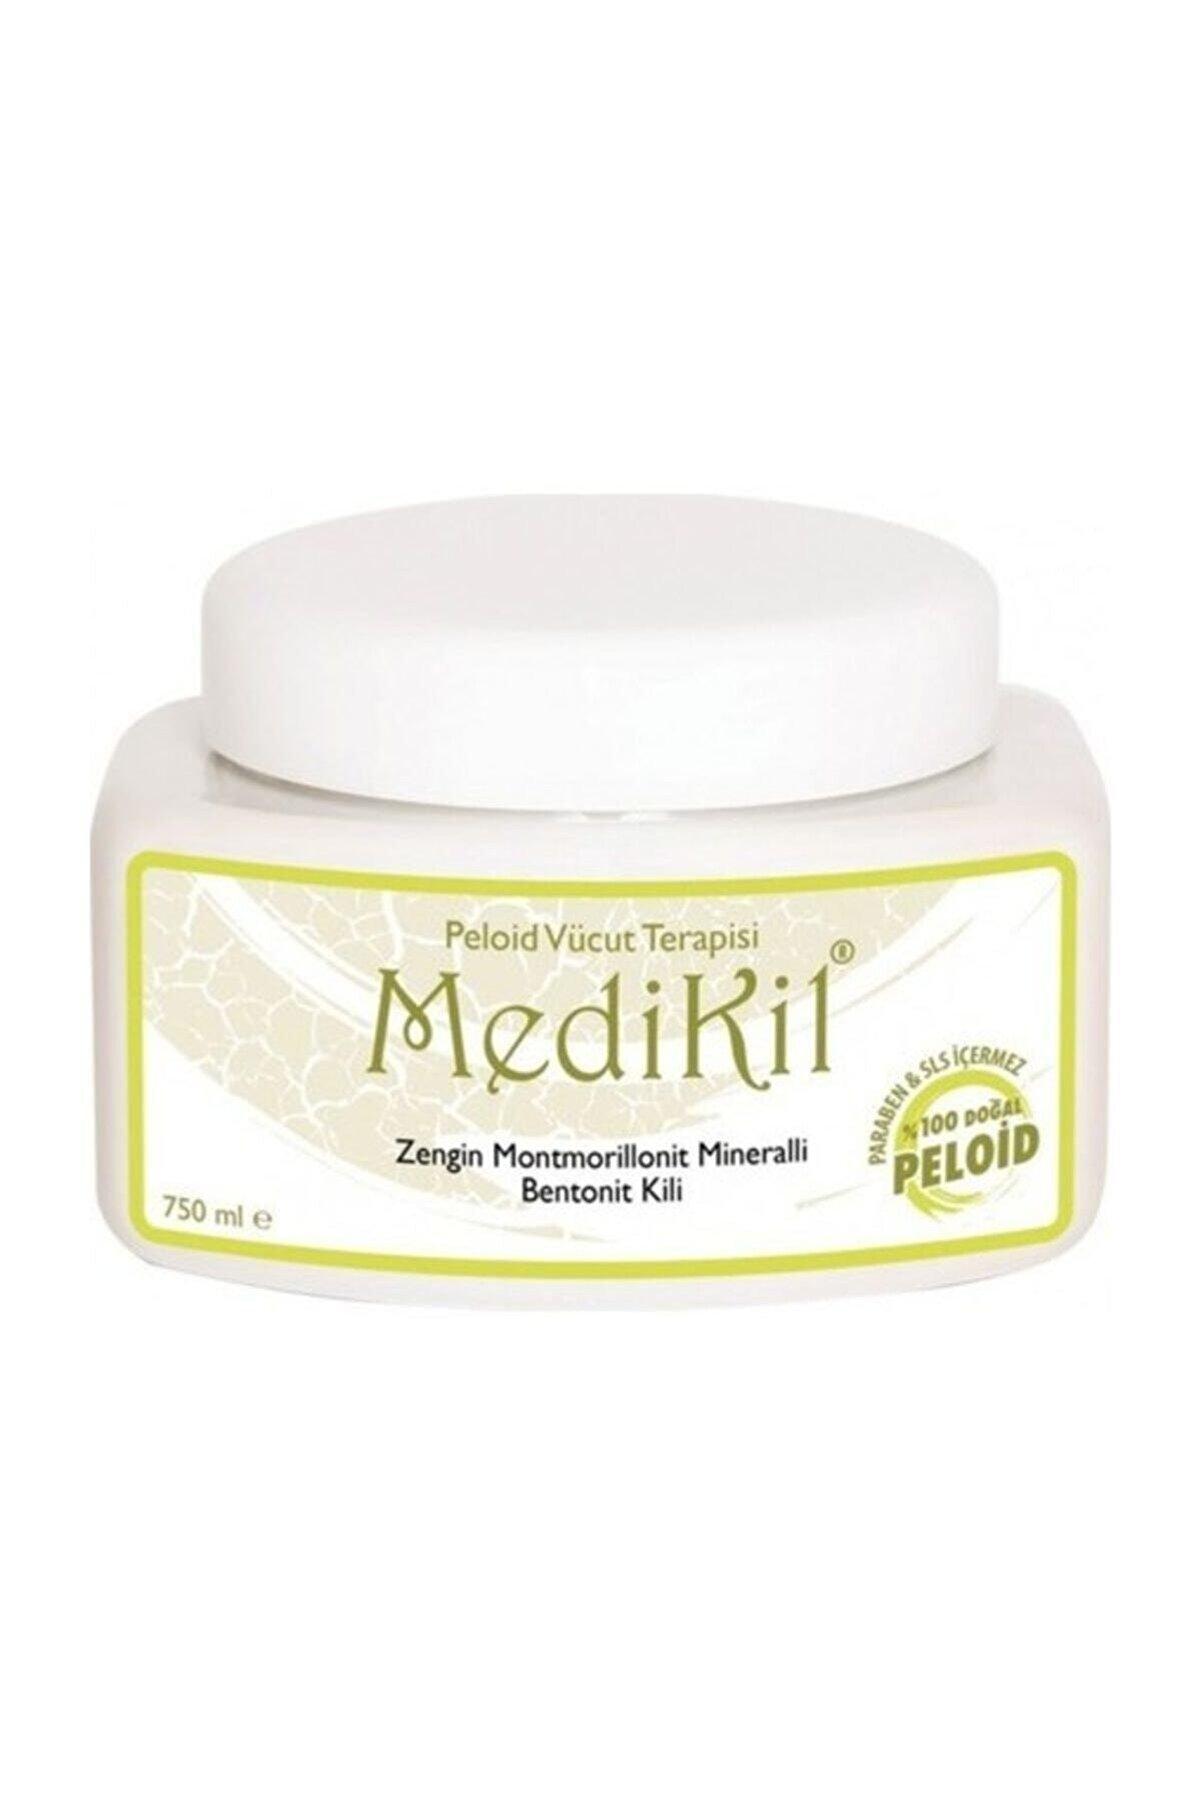 Medikil Peloid Vücut Terapisi Zengin Montmorillonit Mineralli Bentonit Kili 750ml